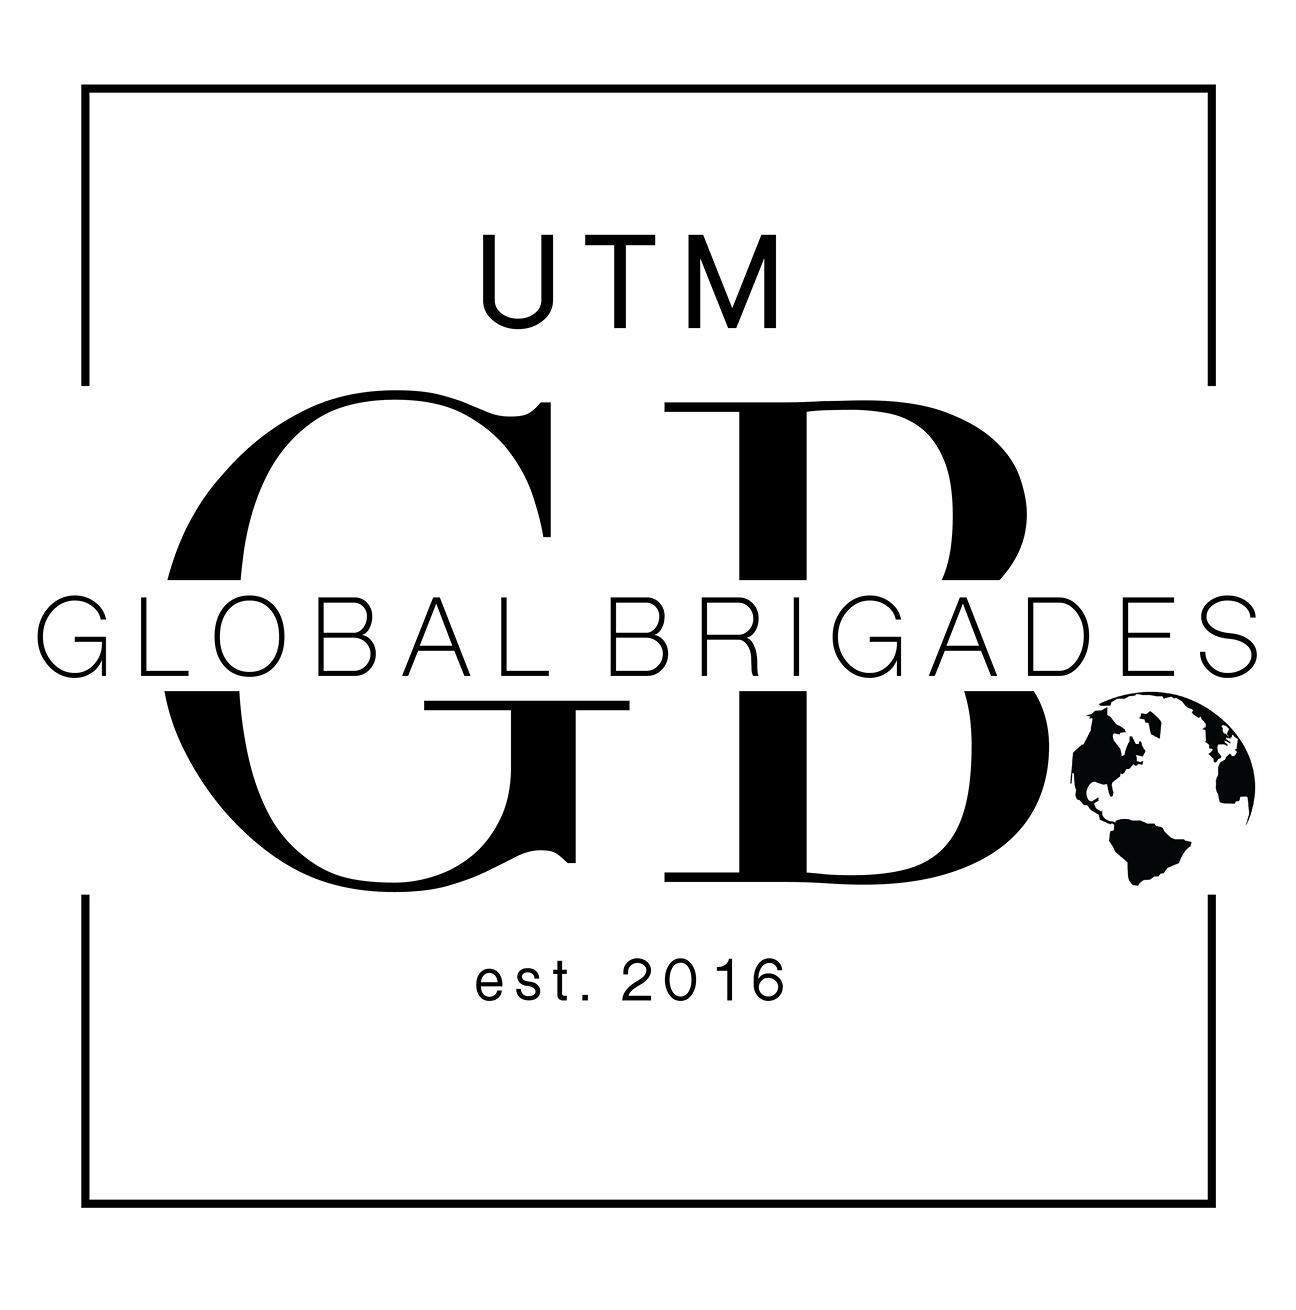 UTM Global Brigades